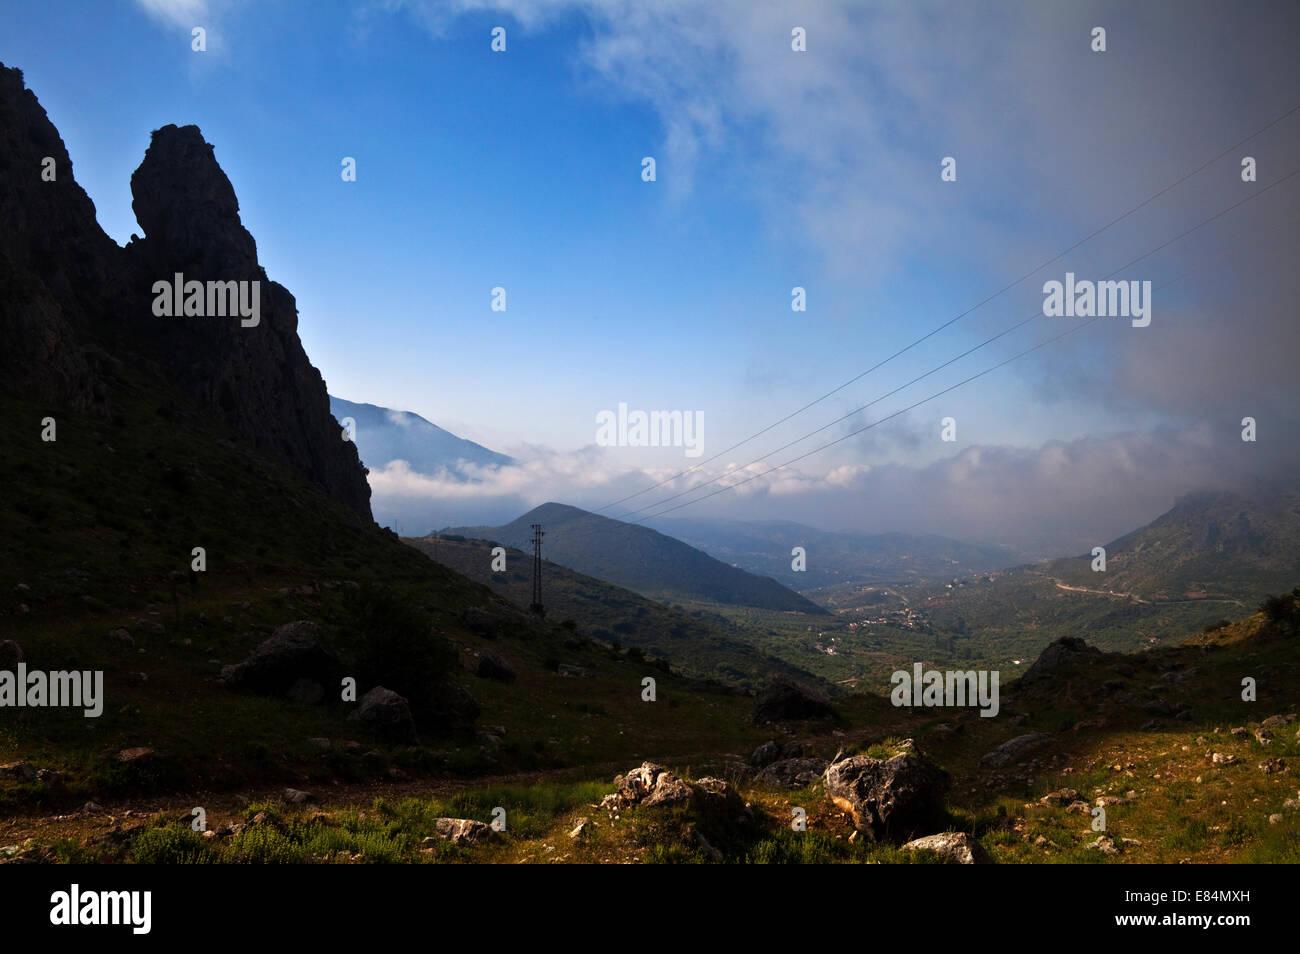 El Boquete de Zafarraya, a mountain pass over the Sierra de Tejeda, Malaga Province, Andalucia, Spain - Stock Image